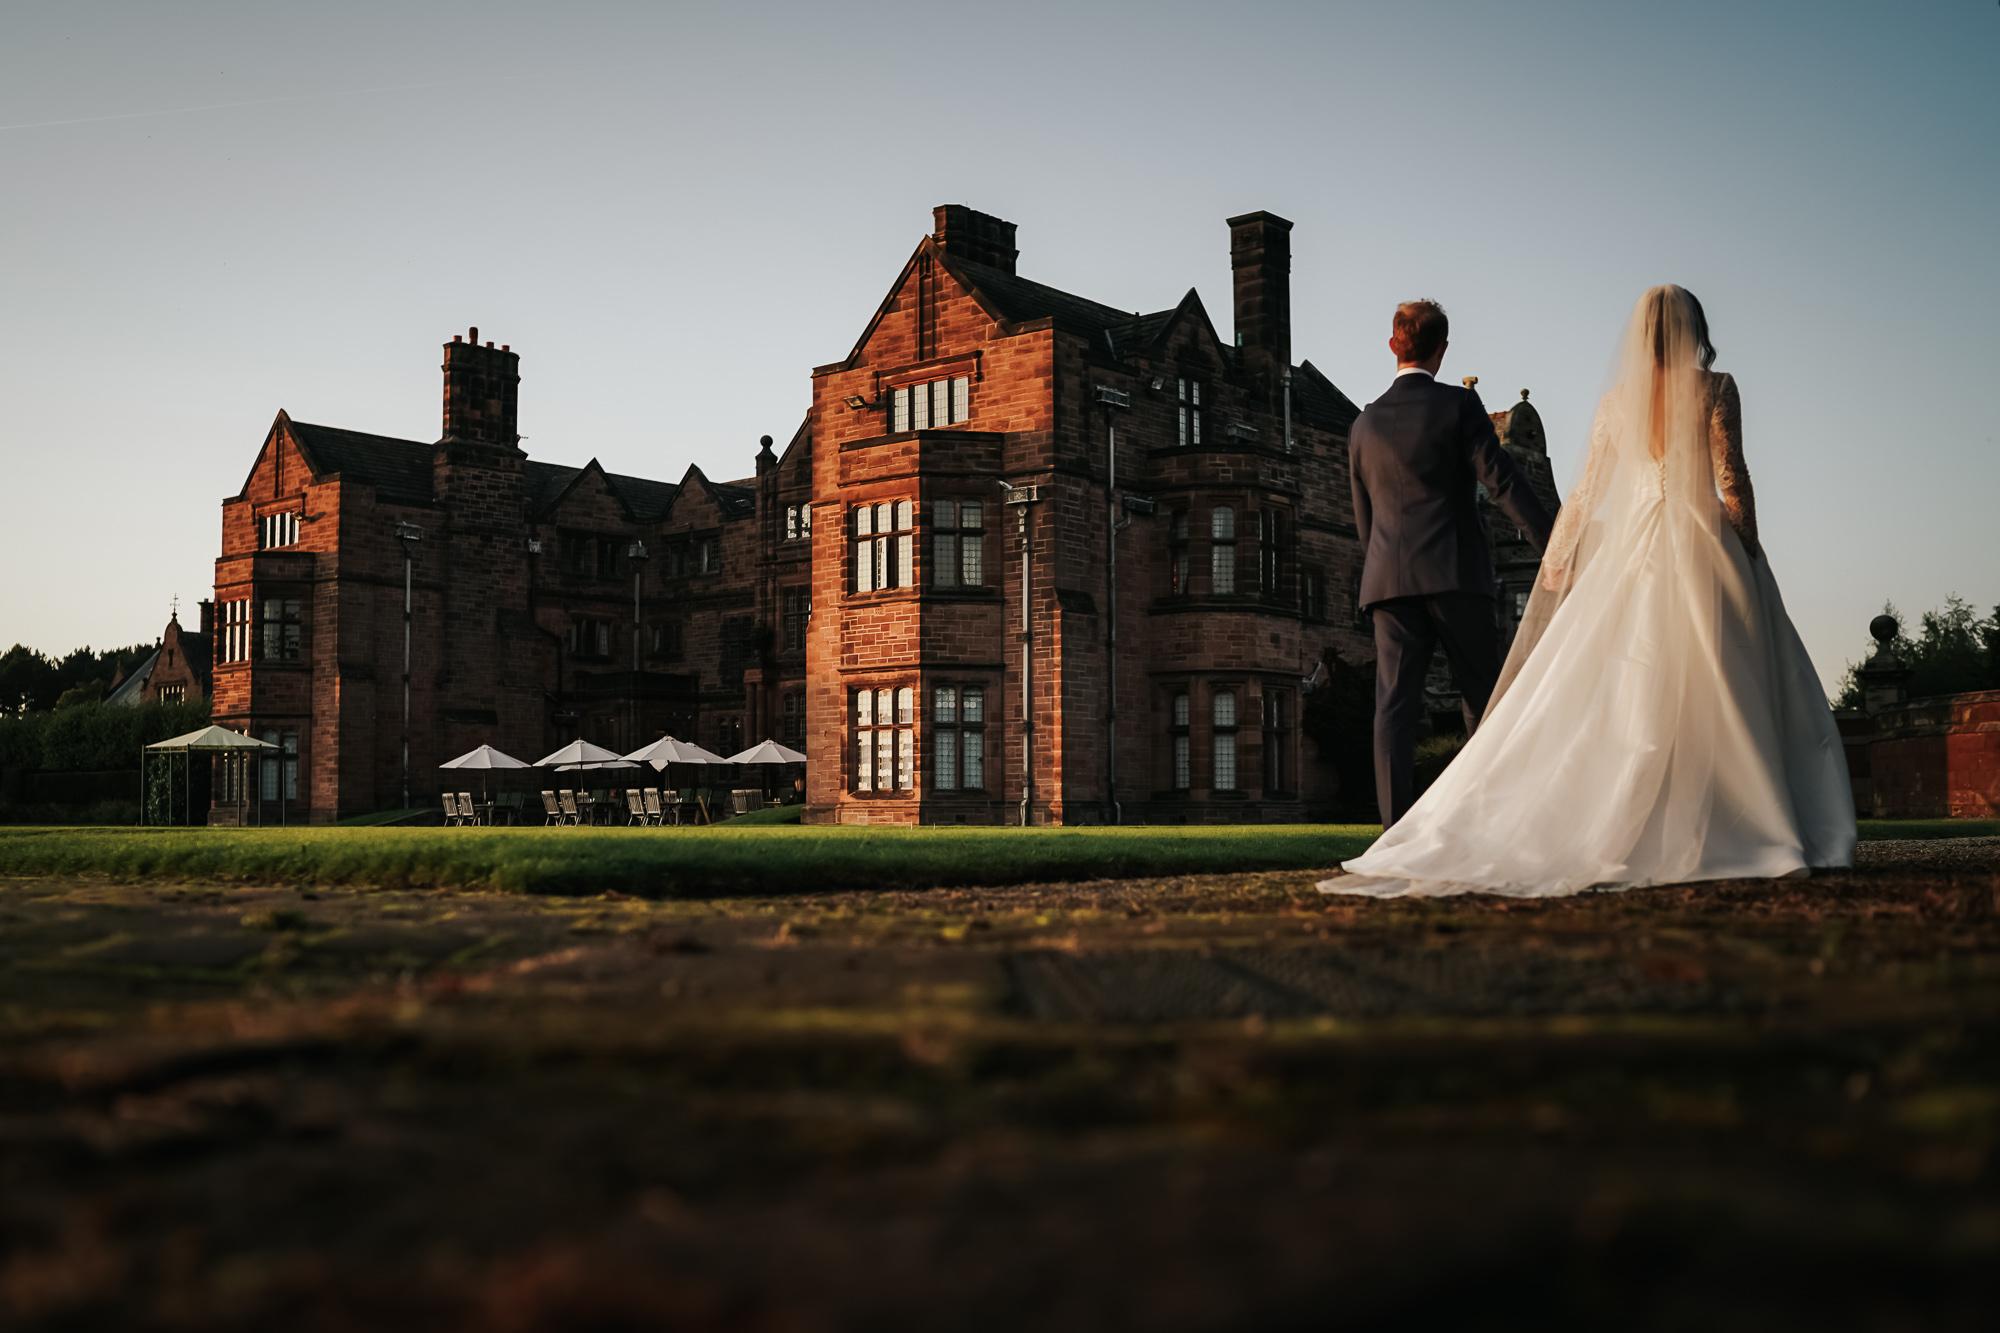 Thornton Manor Cheshire wedding photographer Wedding Photography Cheshire wedding photographer (56 of 64).jpg